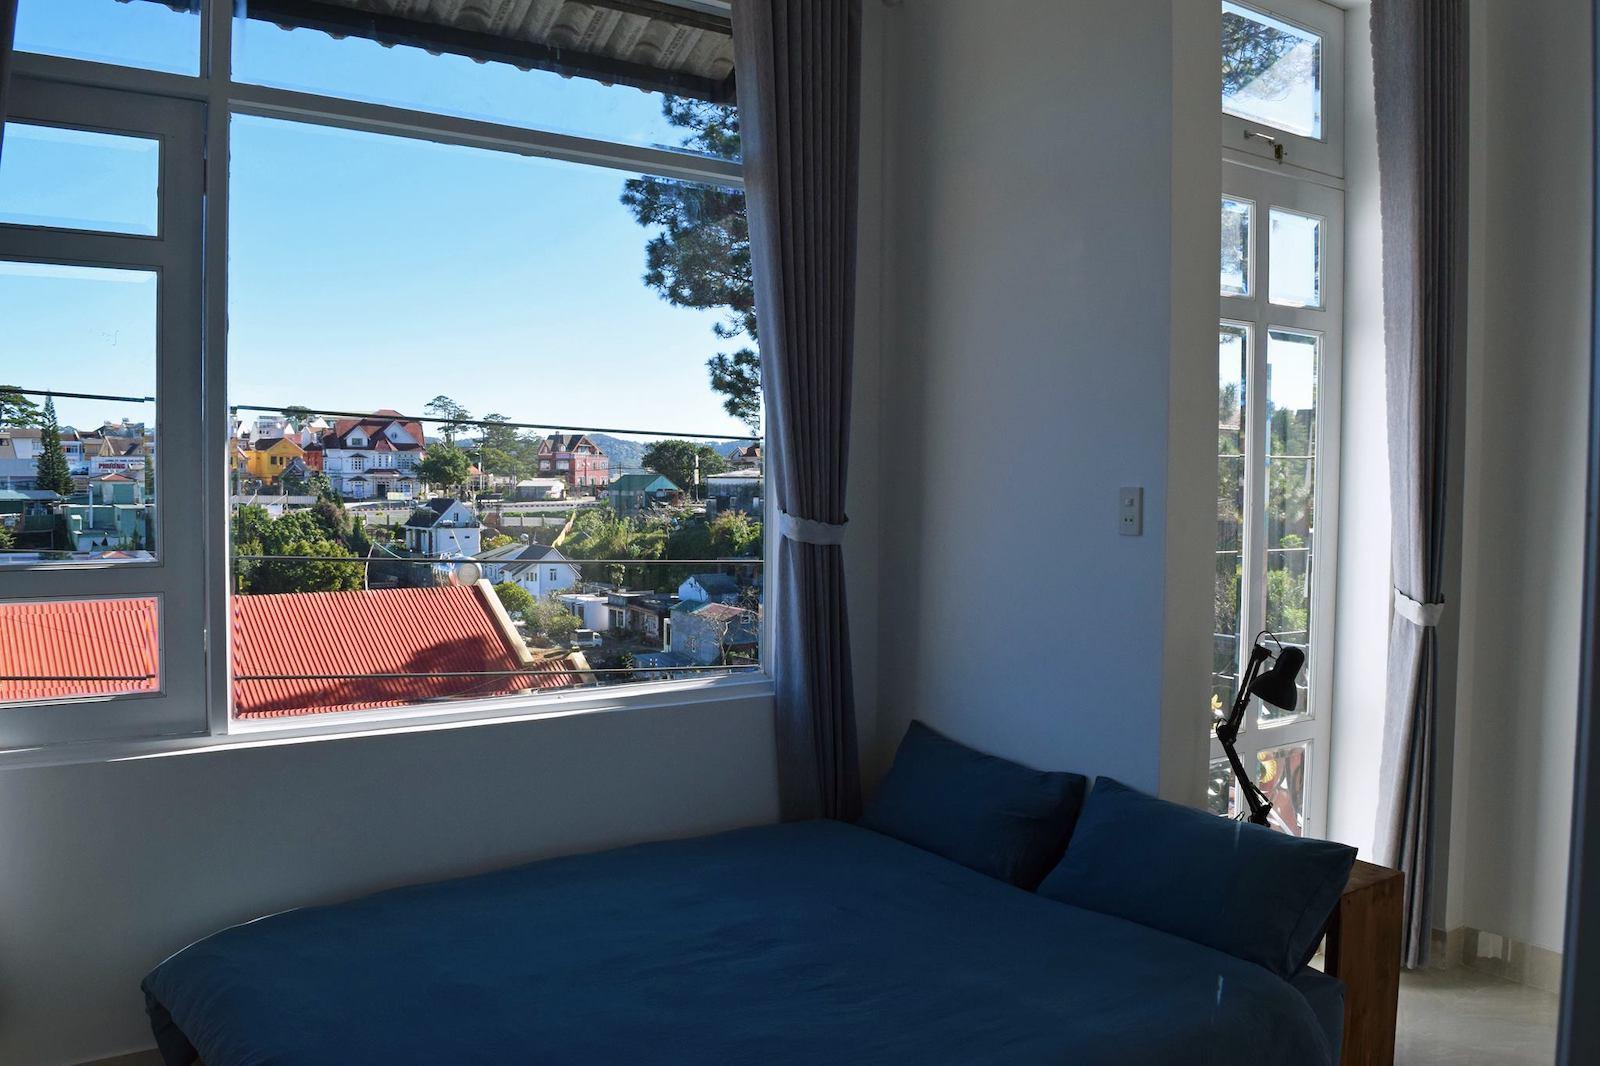 Image of the bedroom from SANY Hostel in Dalat, Vietnam